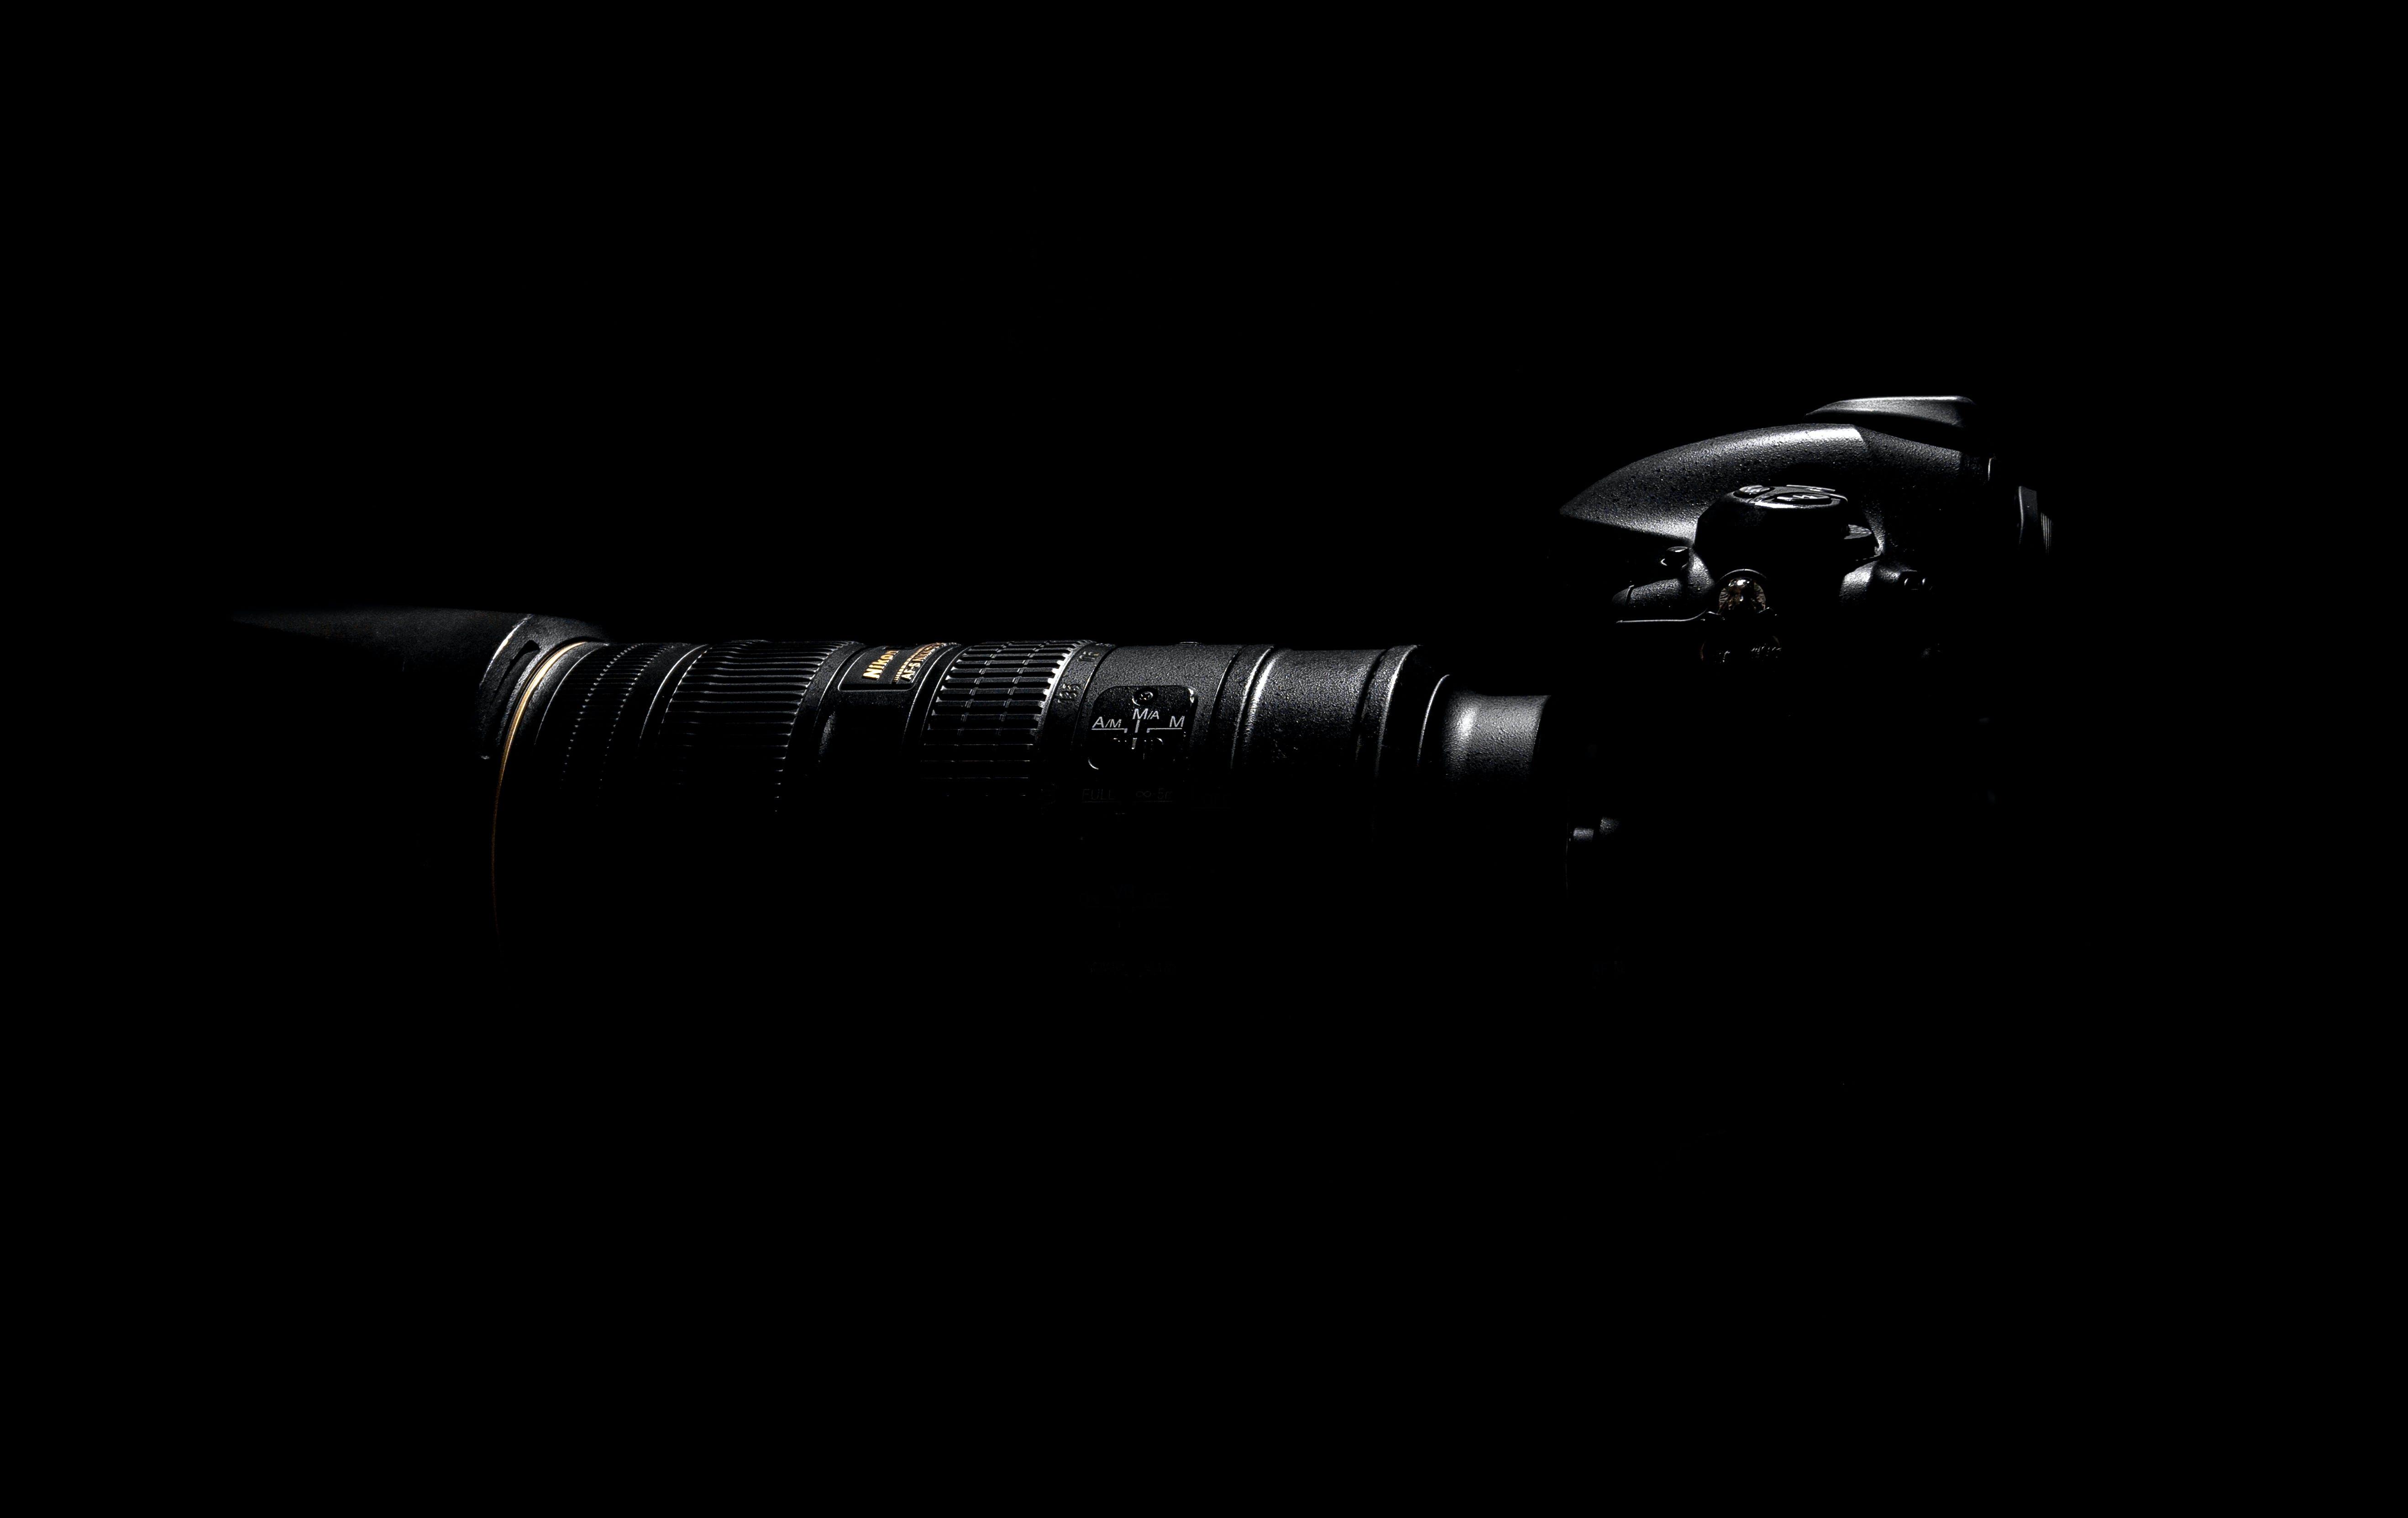 Top View Photo of Black DSLR Camera